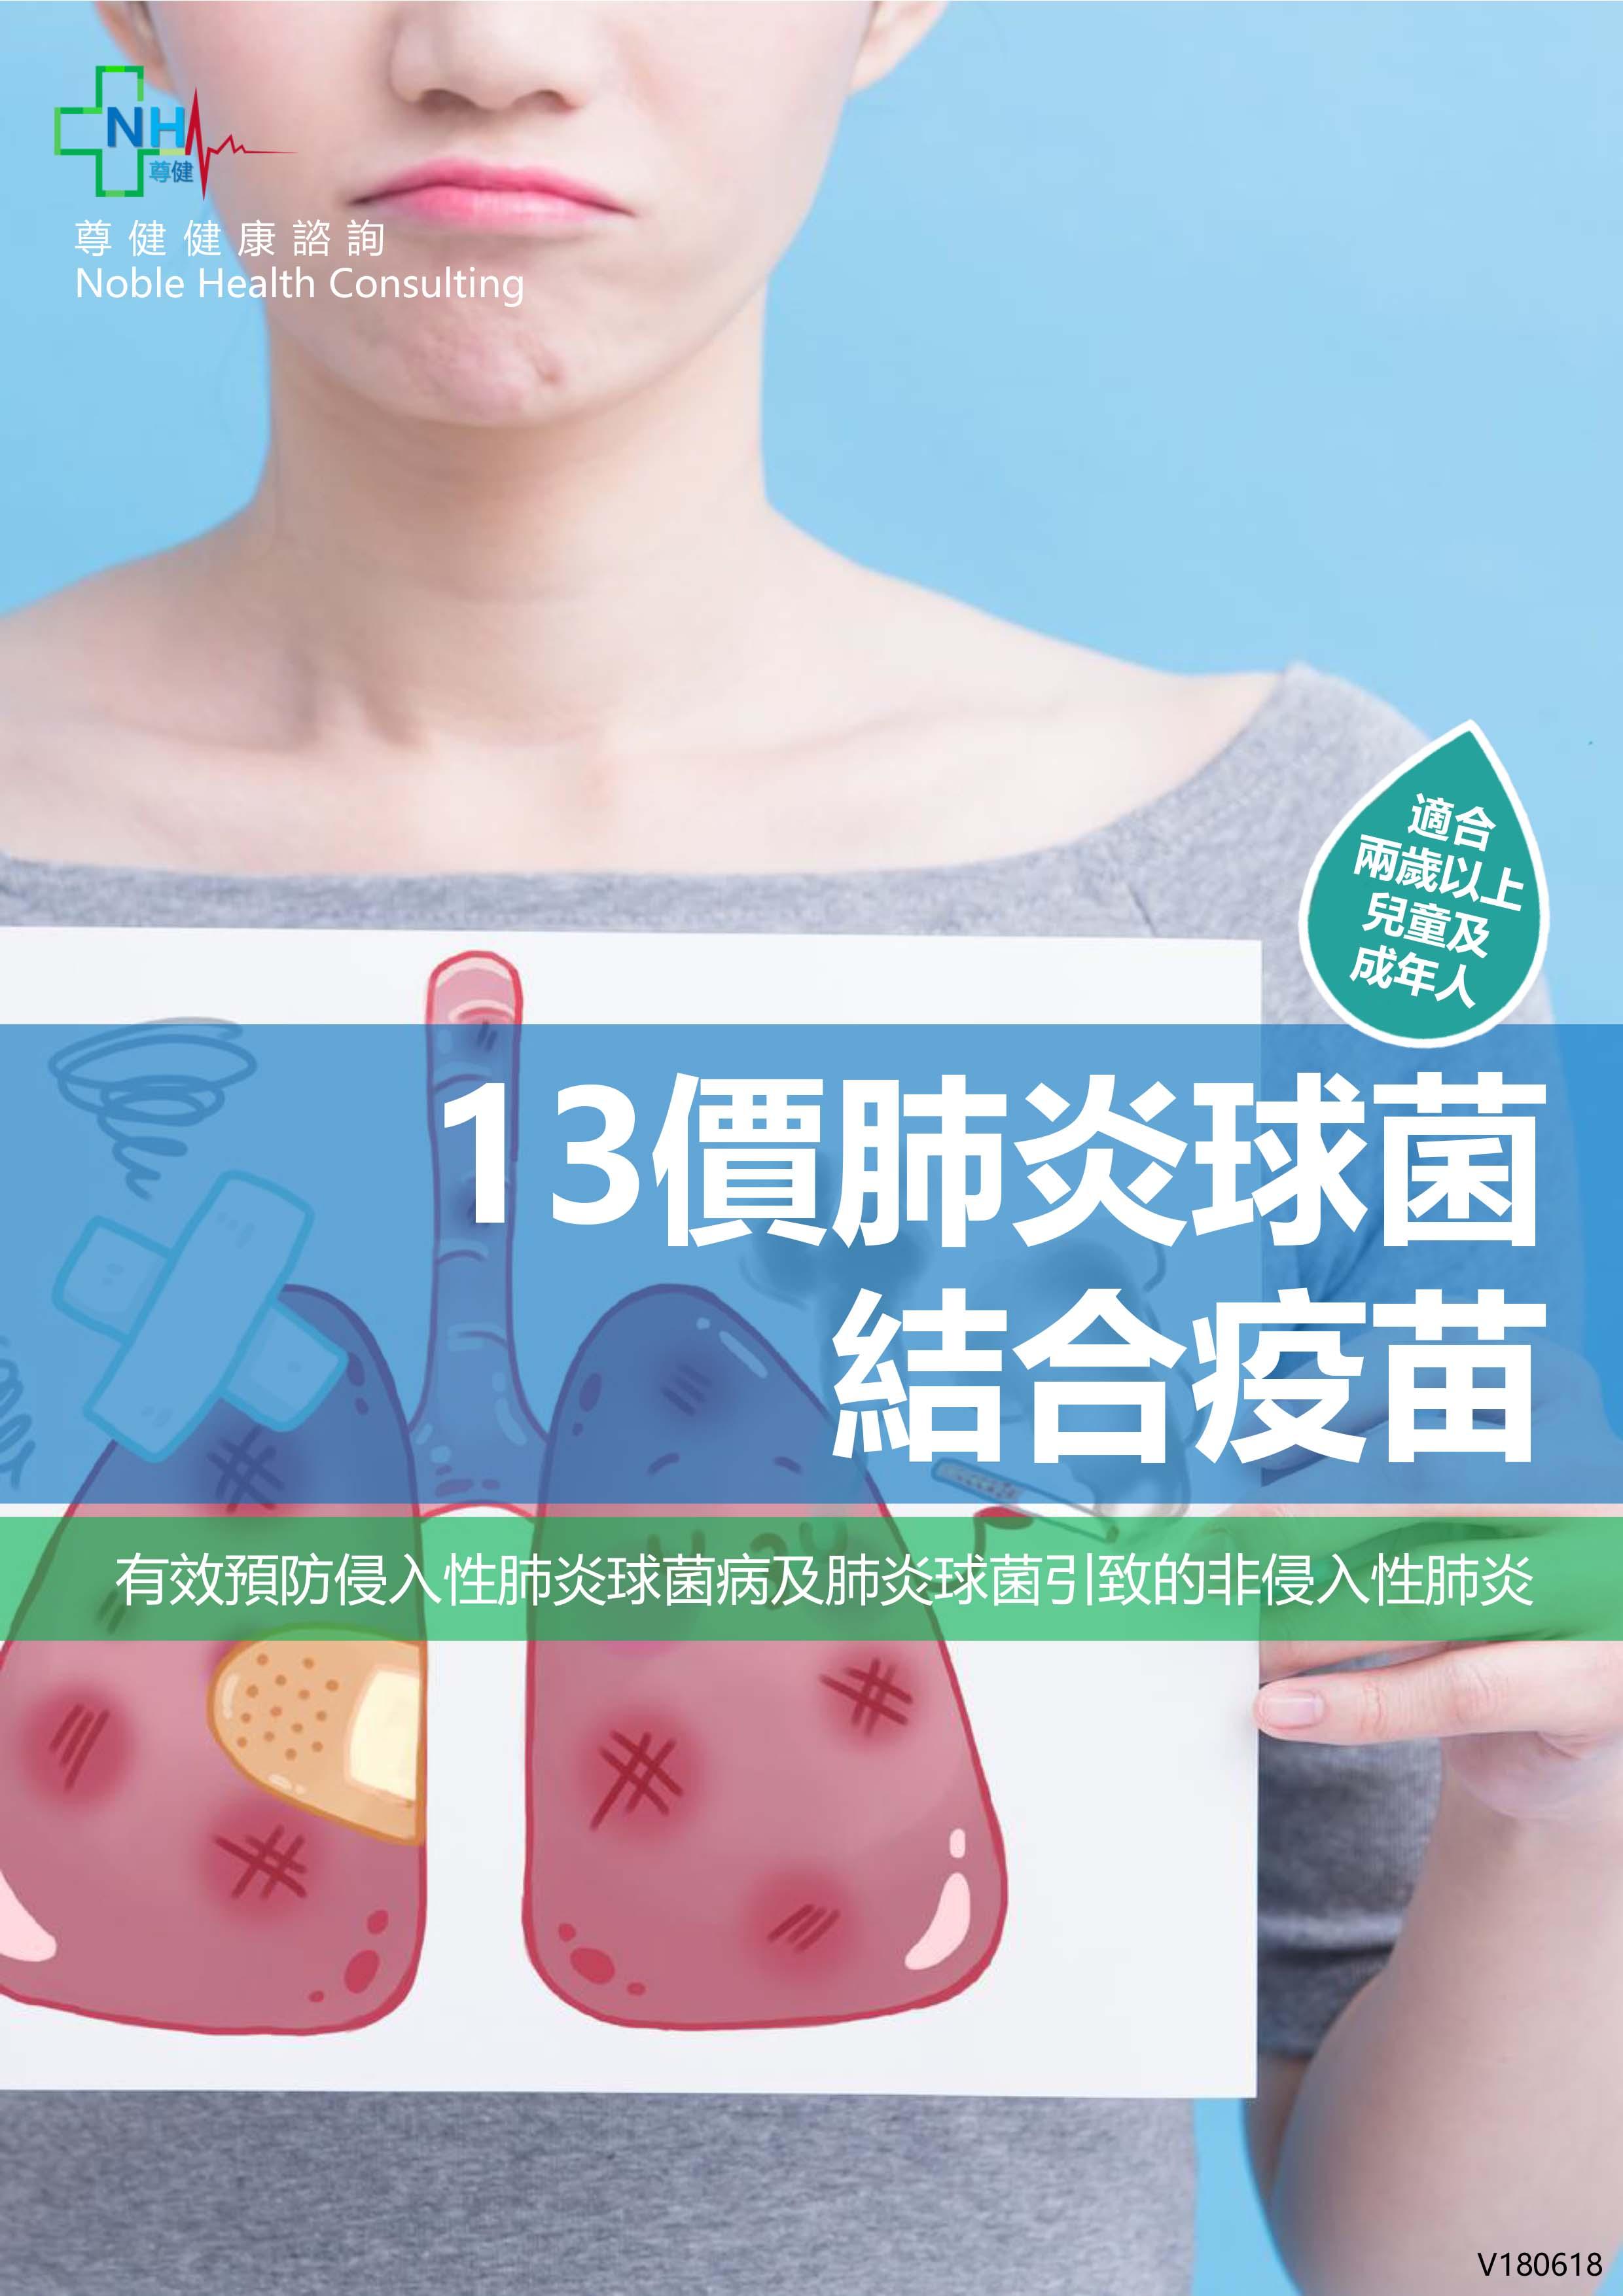 3c-pneumonia-lung-vaccine-1.jpg